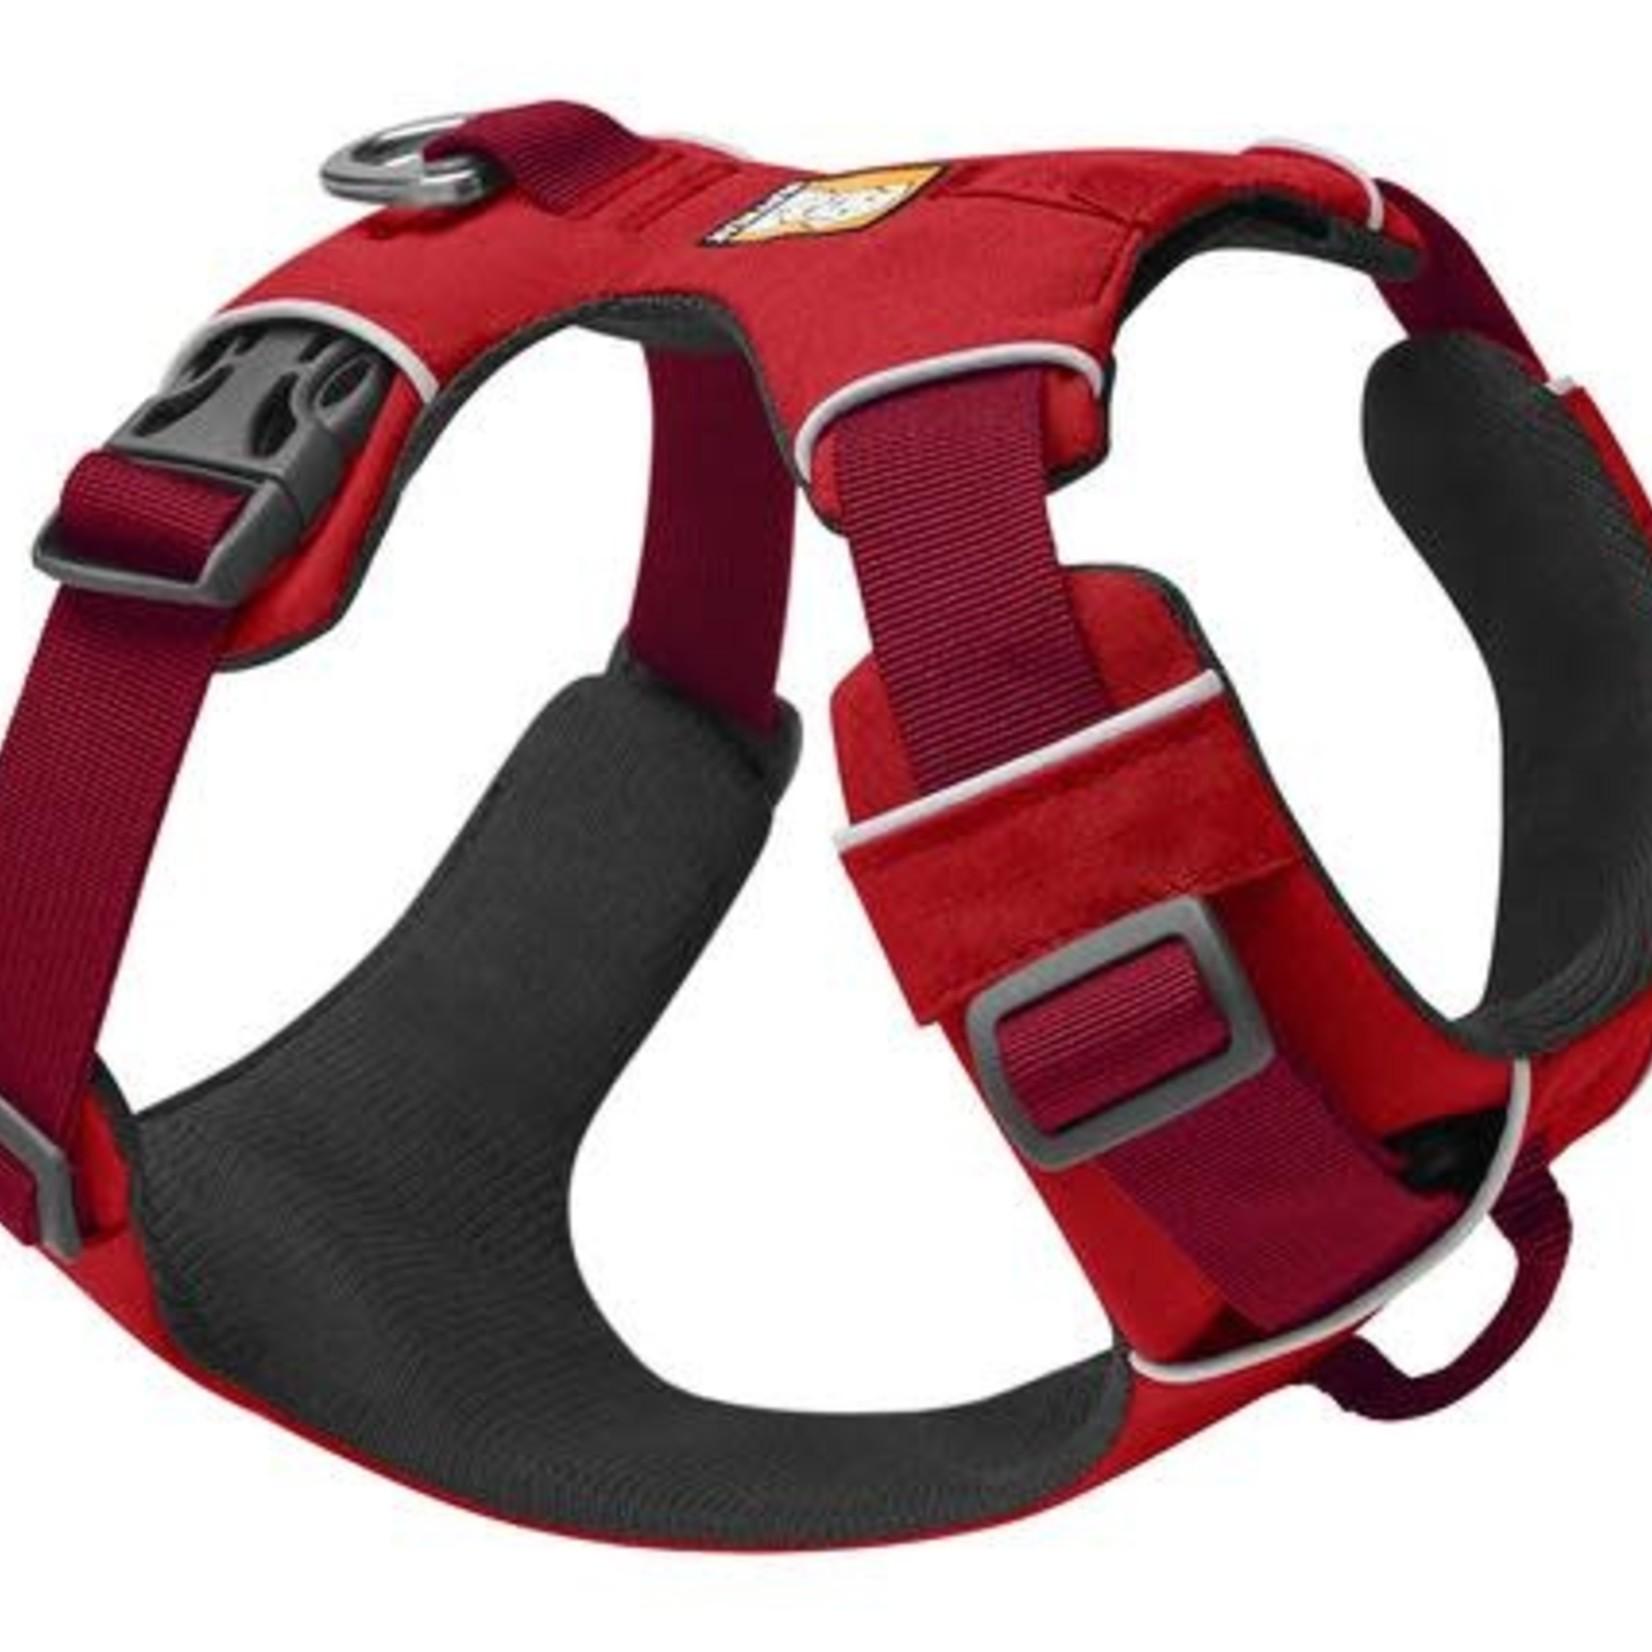 Ruff Wear Ruffwear Front Range Harness Red Sumac X-Small